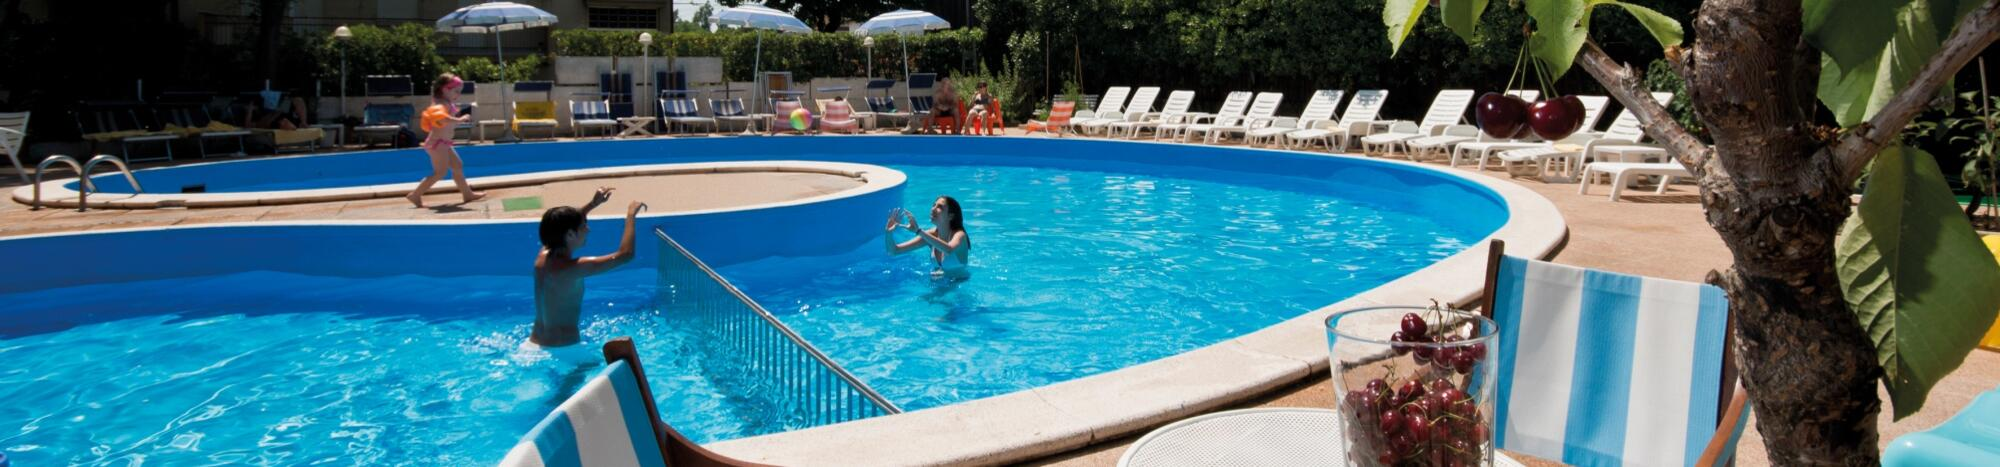 Angebot für Juni am Meer in Rimini in einem Hotel in Strandnähe